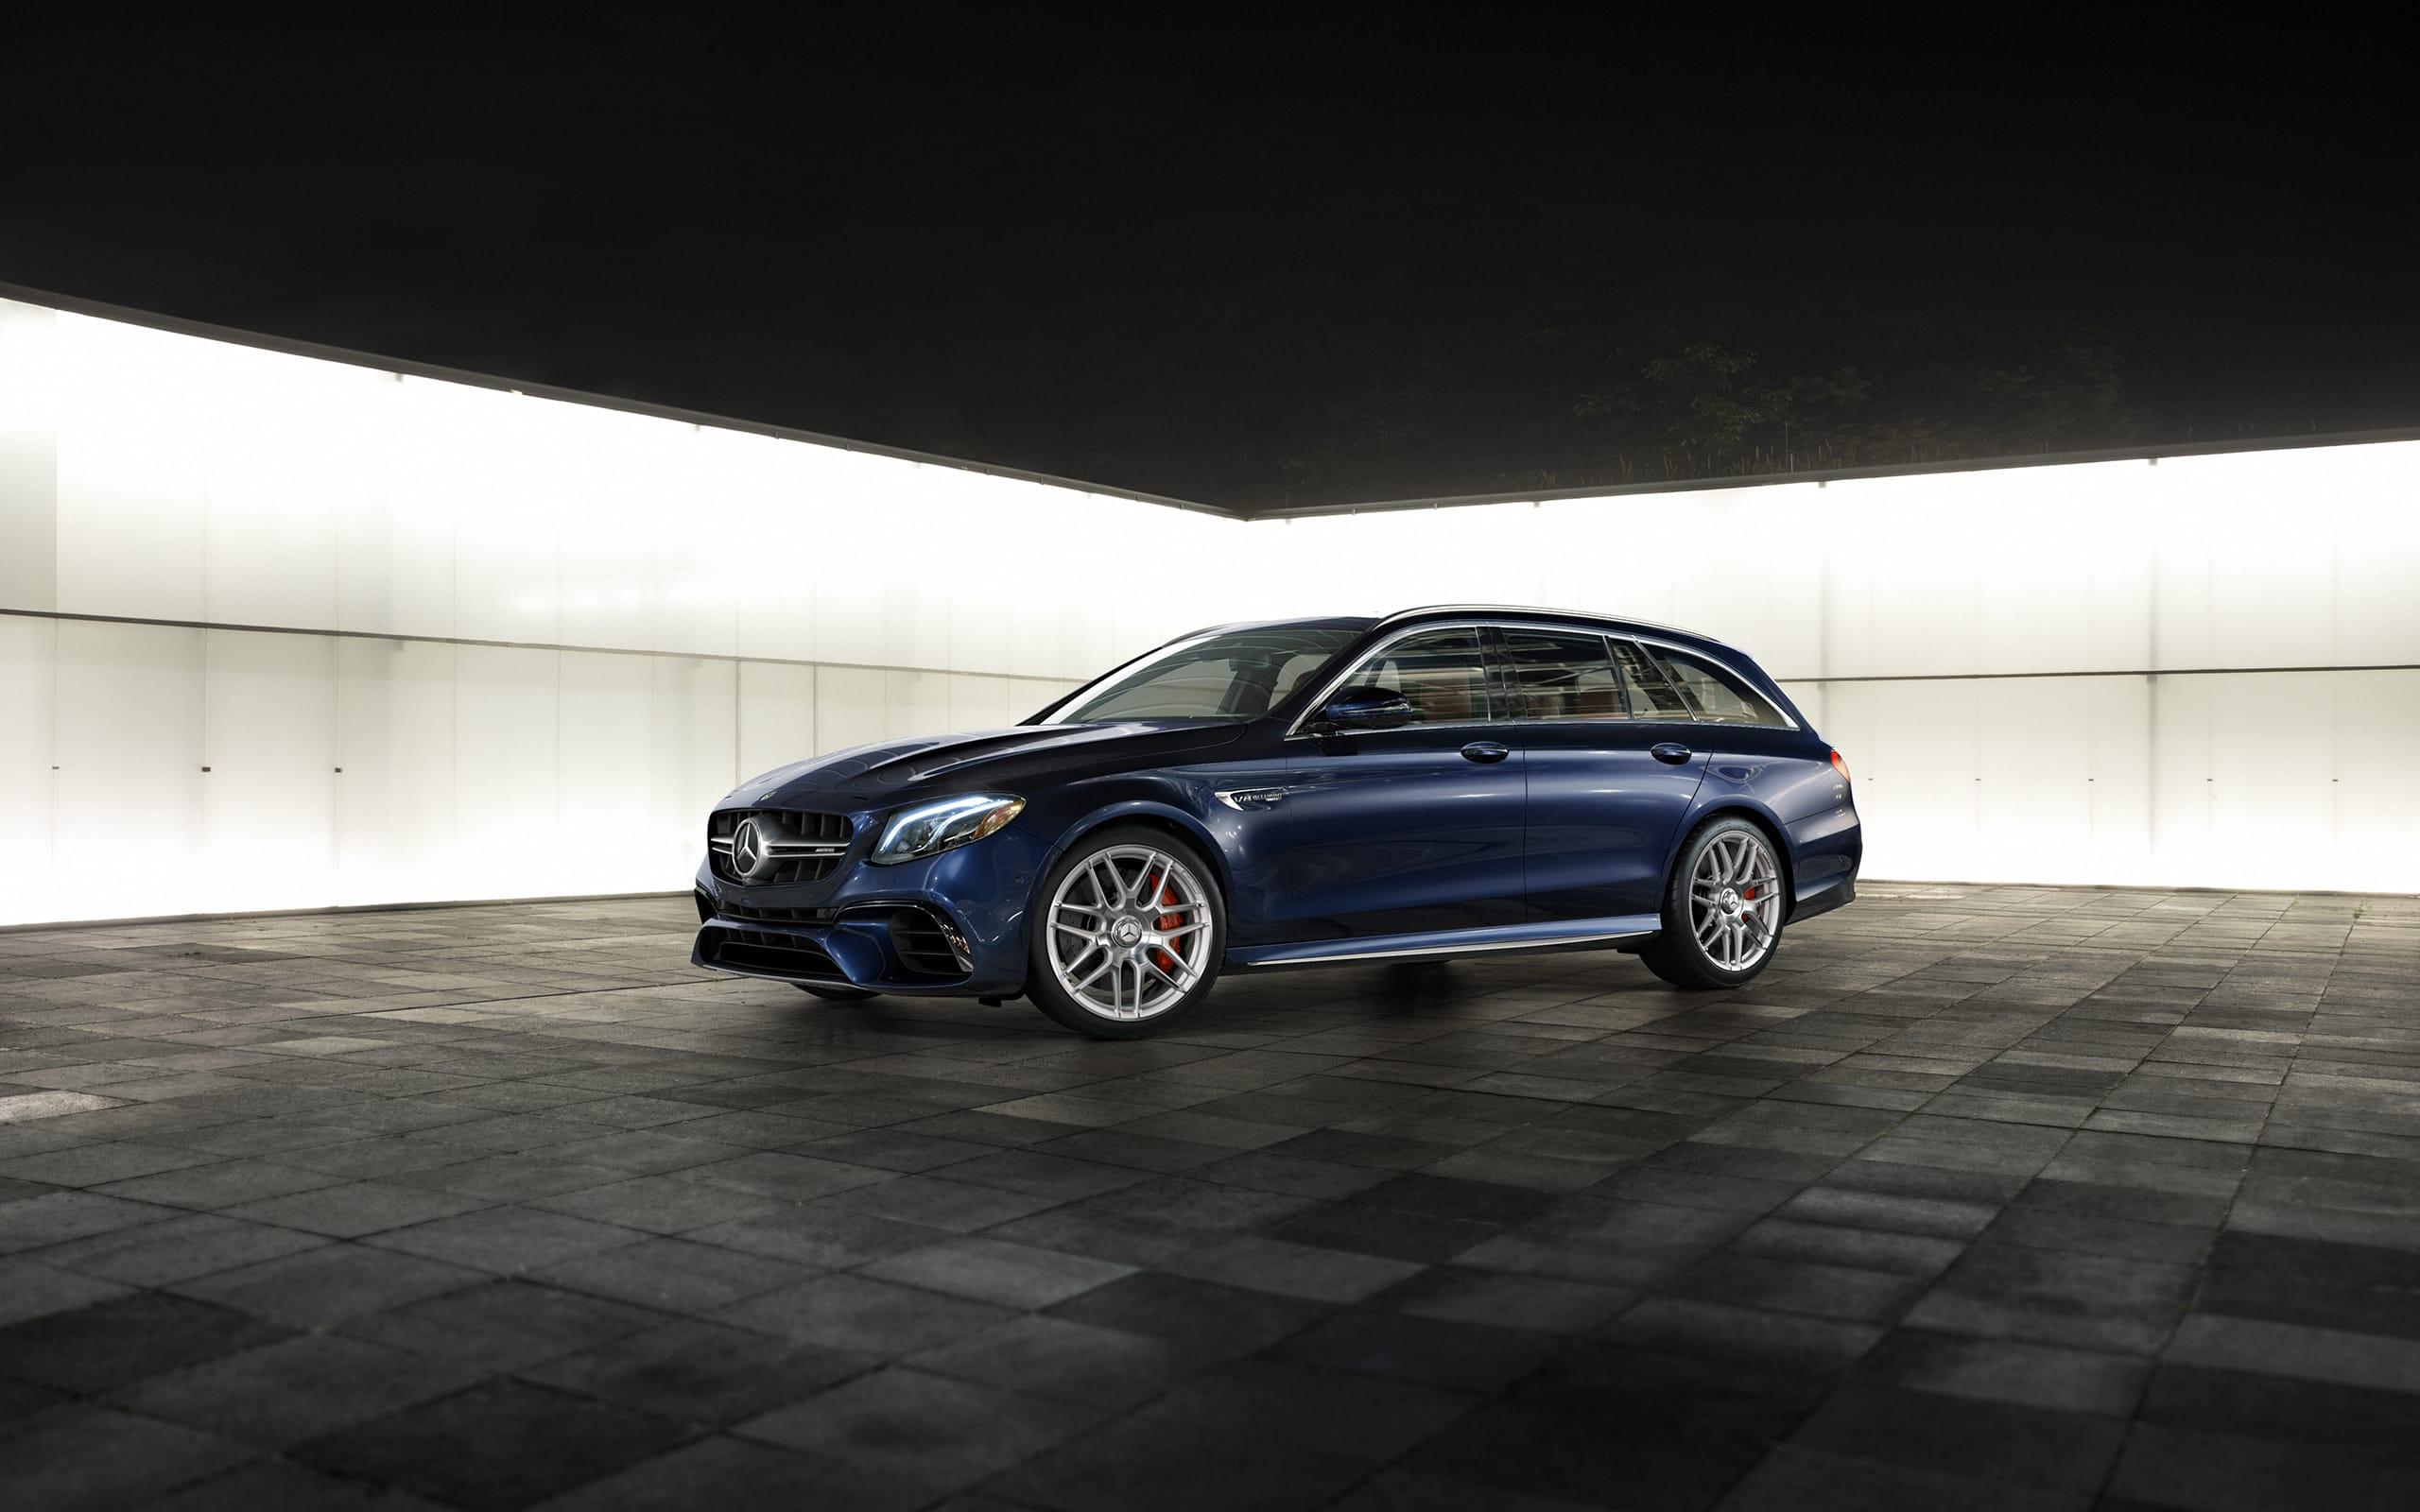 2019 Mercedes-Benz AMG E 63 S 4Matic+ Wagon